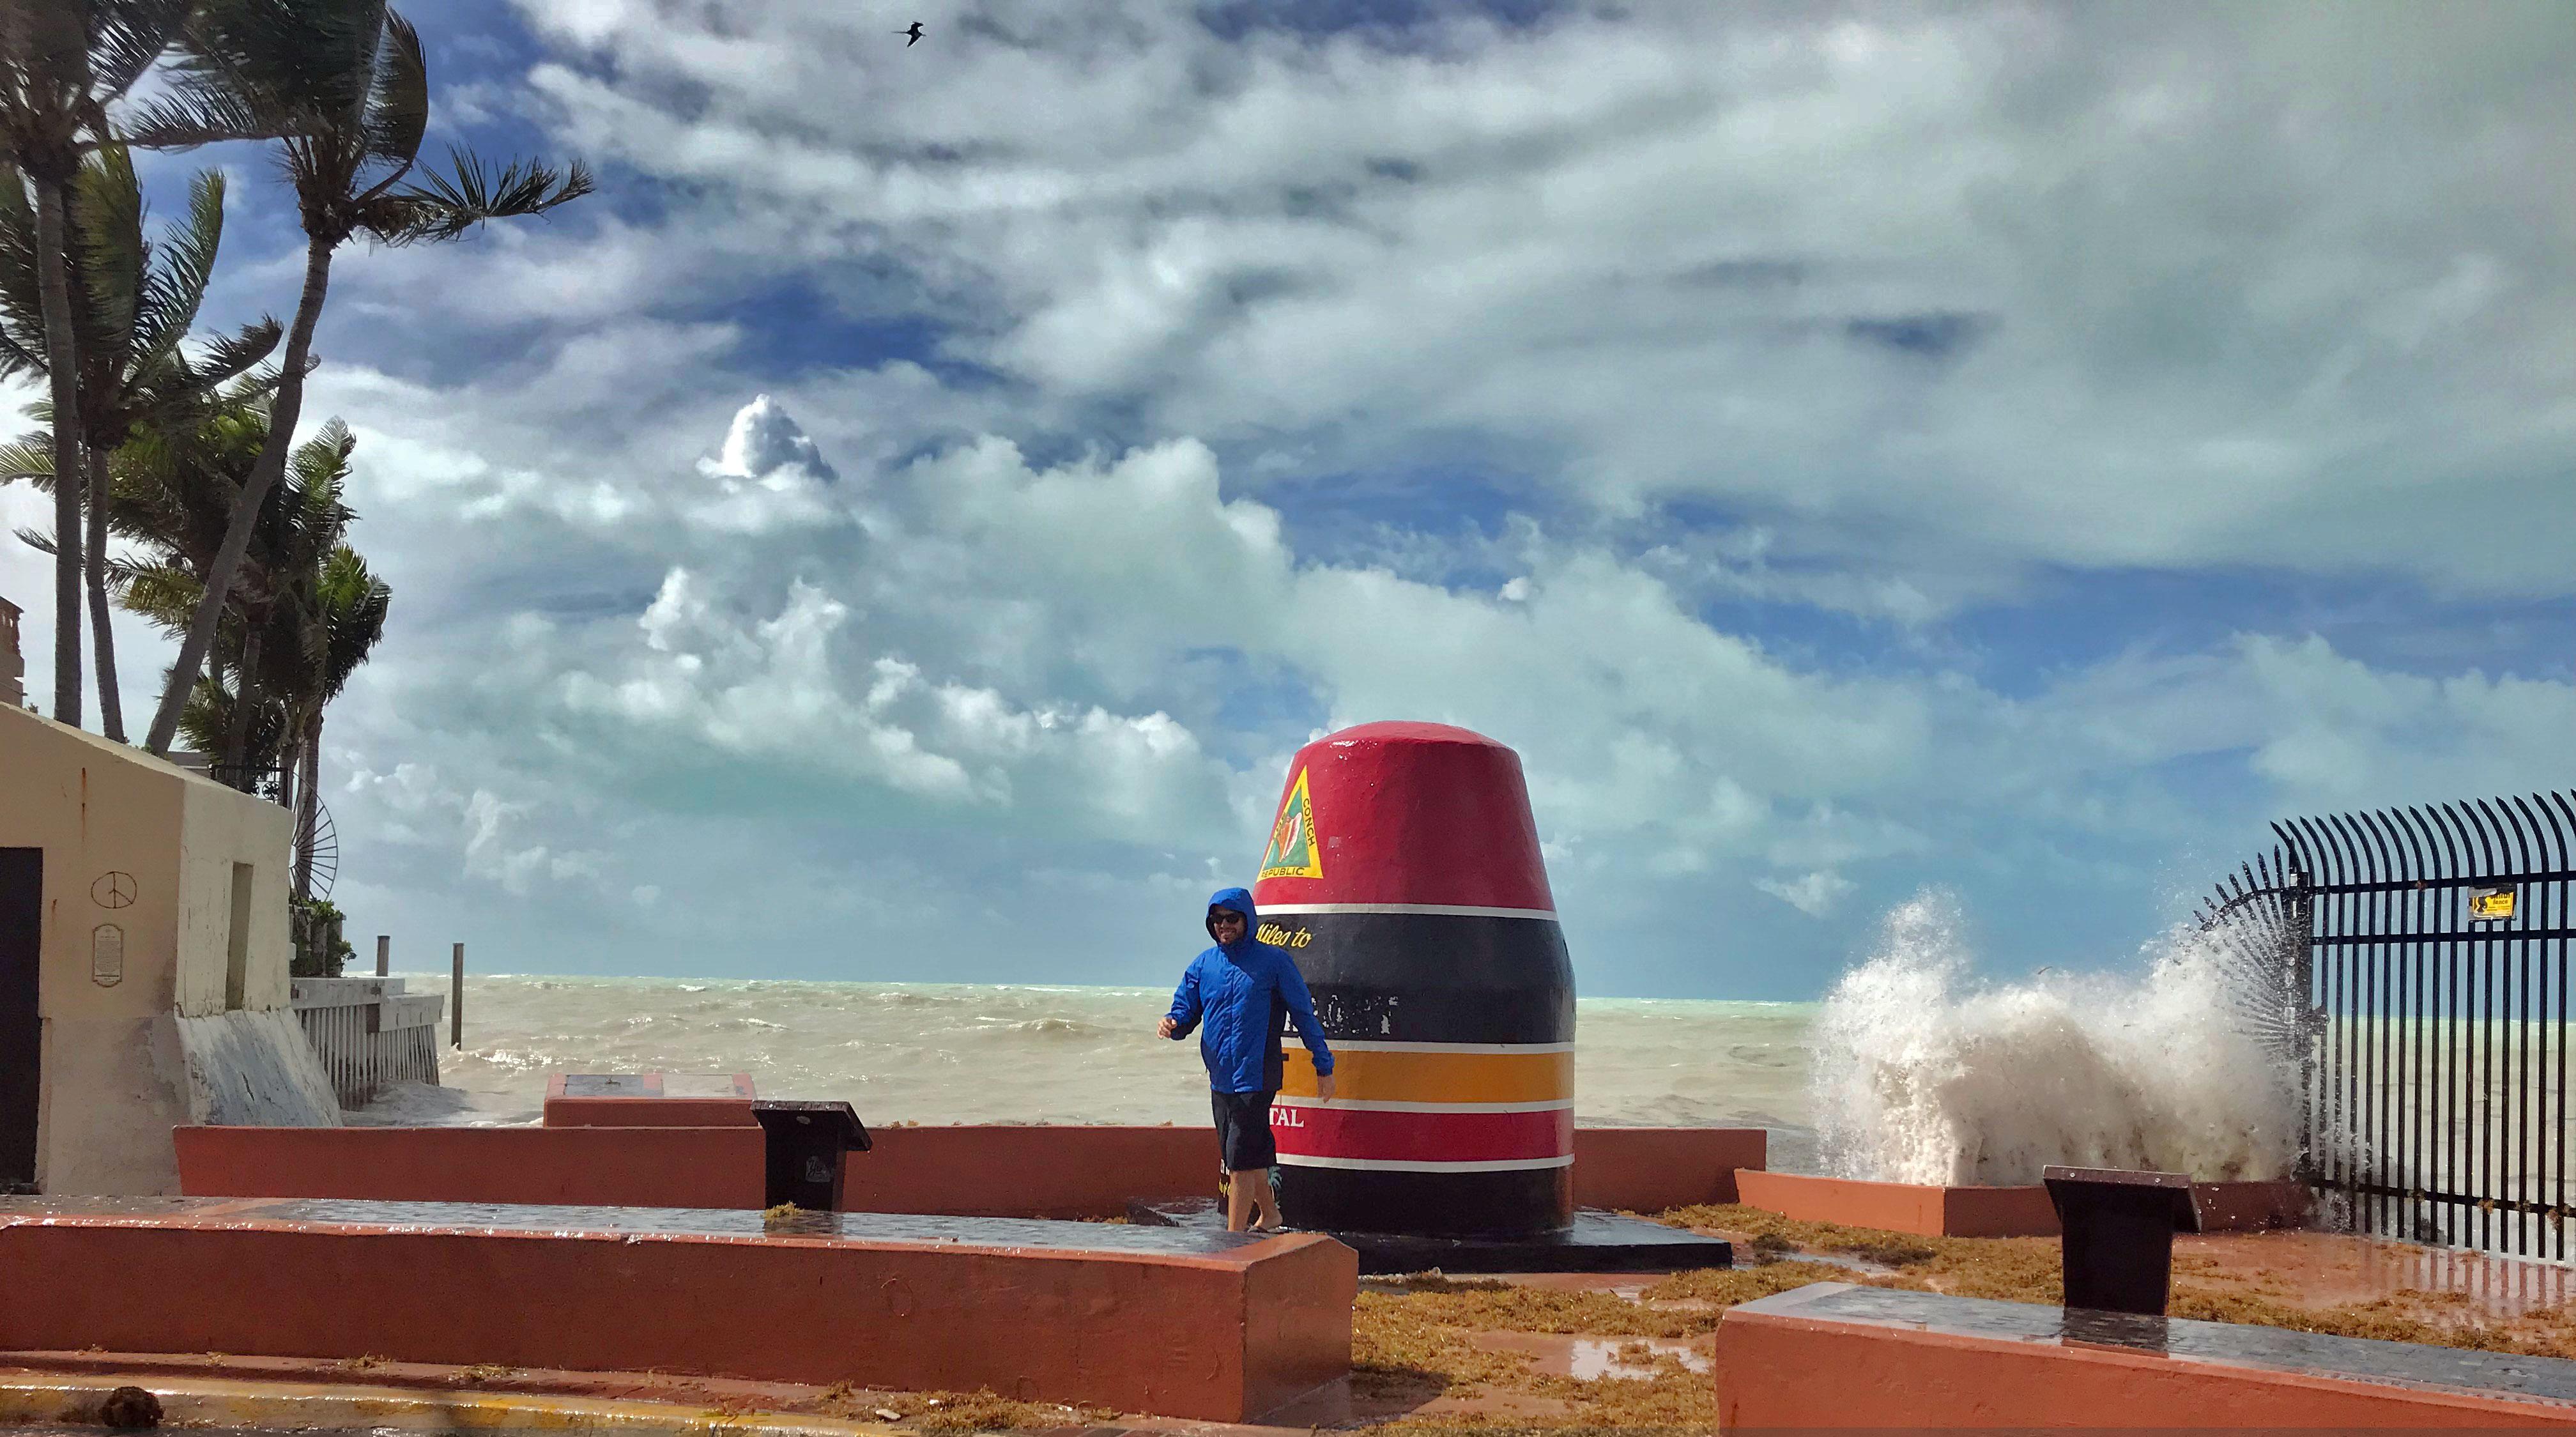 Man on the beach of key west wearing a rain coat before it starts to rain